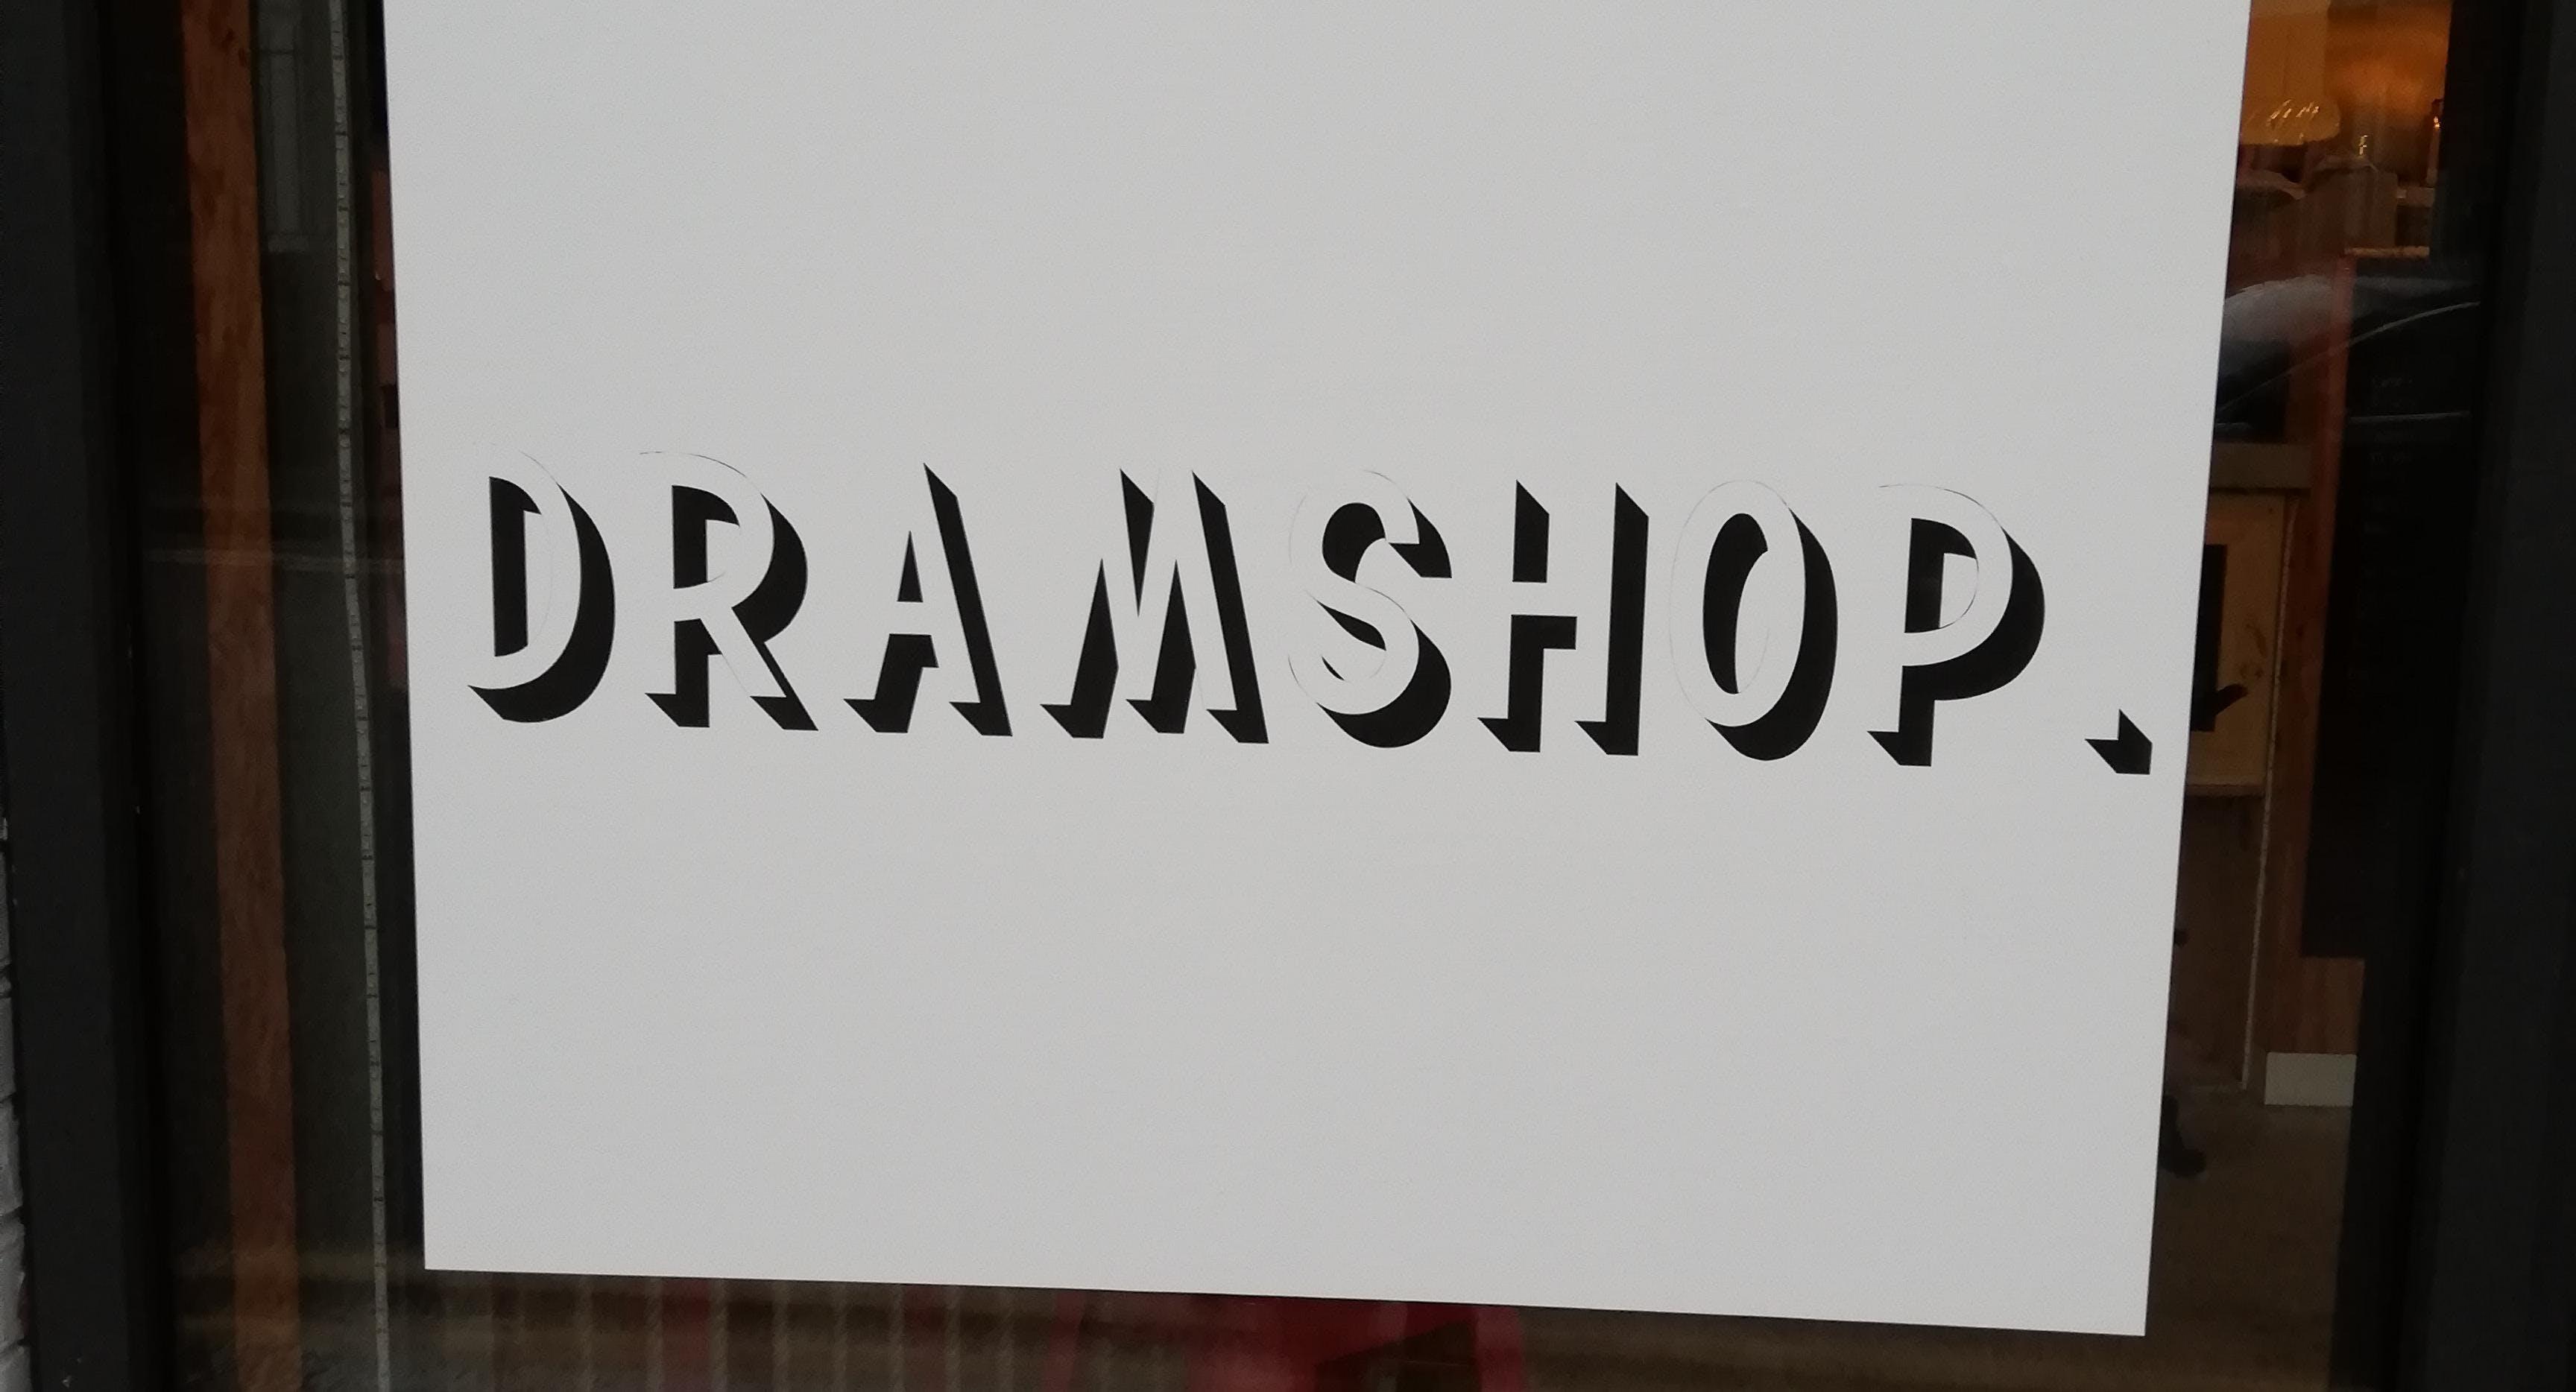 Dramshop Liverpool image 2